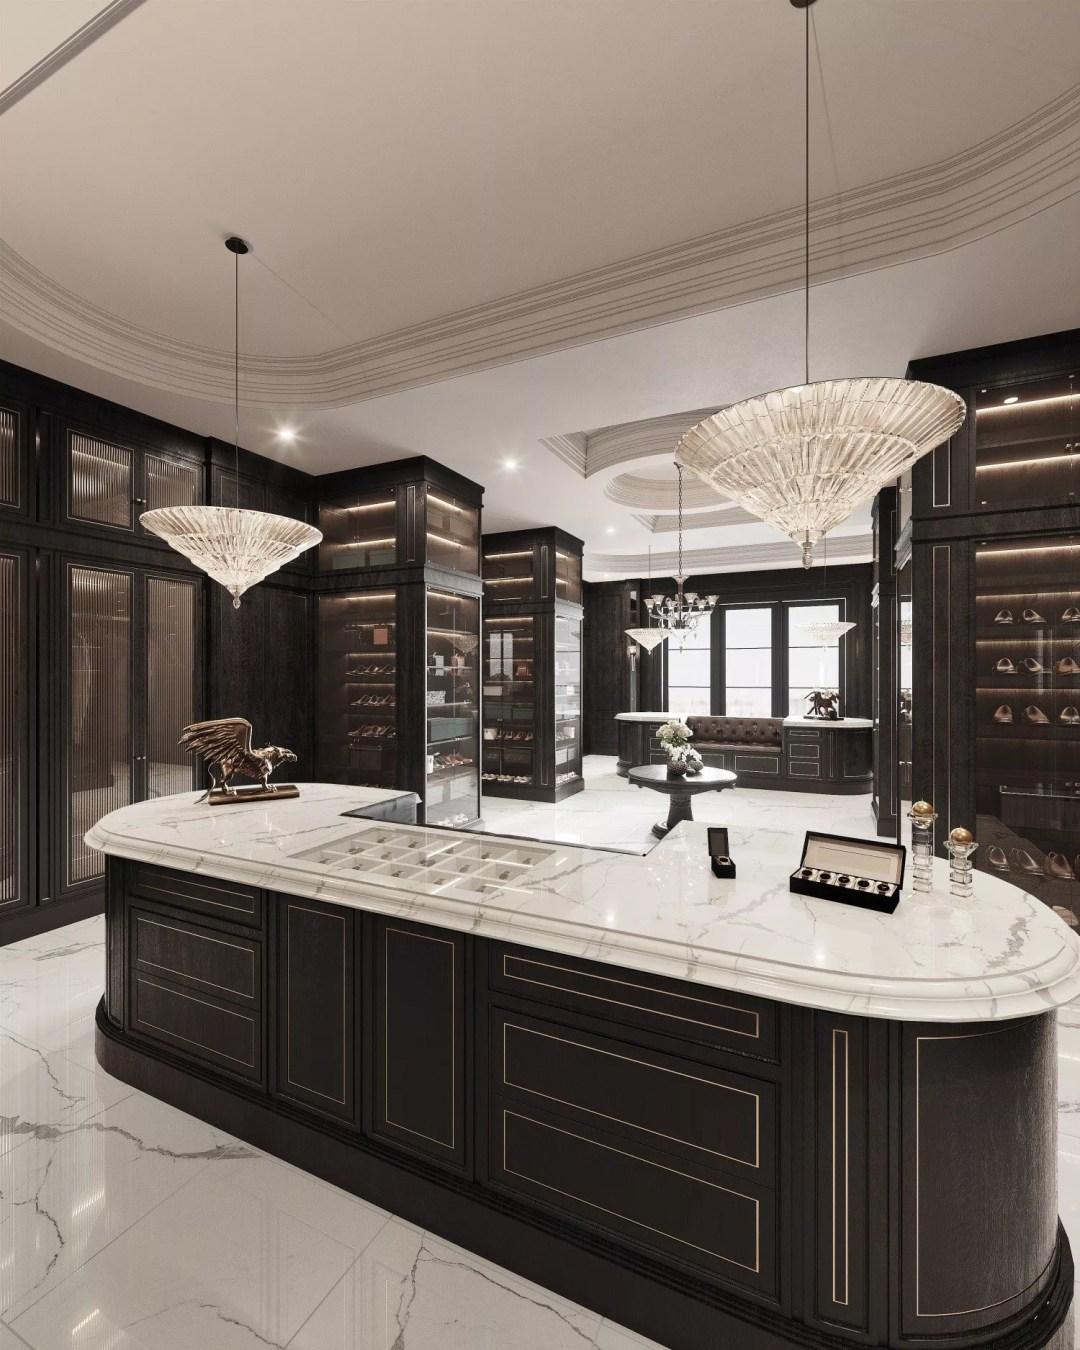 3d Room Interior Design: Photo-realistic 3D Interior Renderings Using Corona